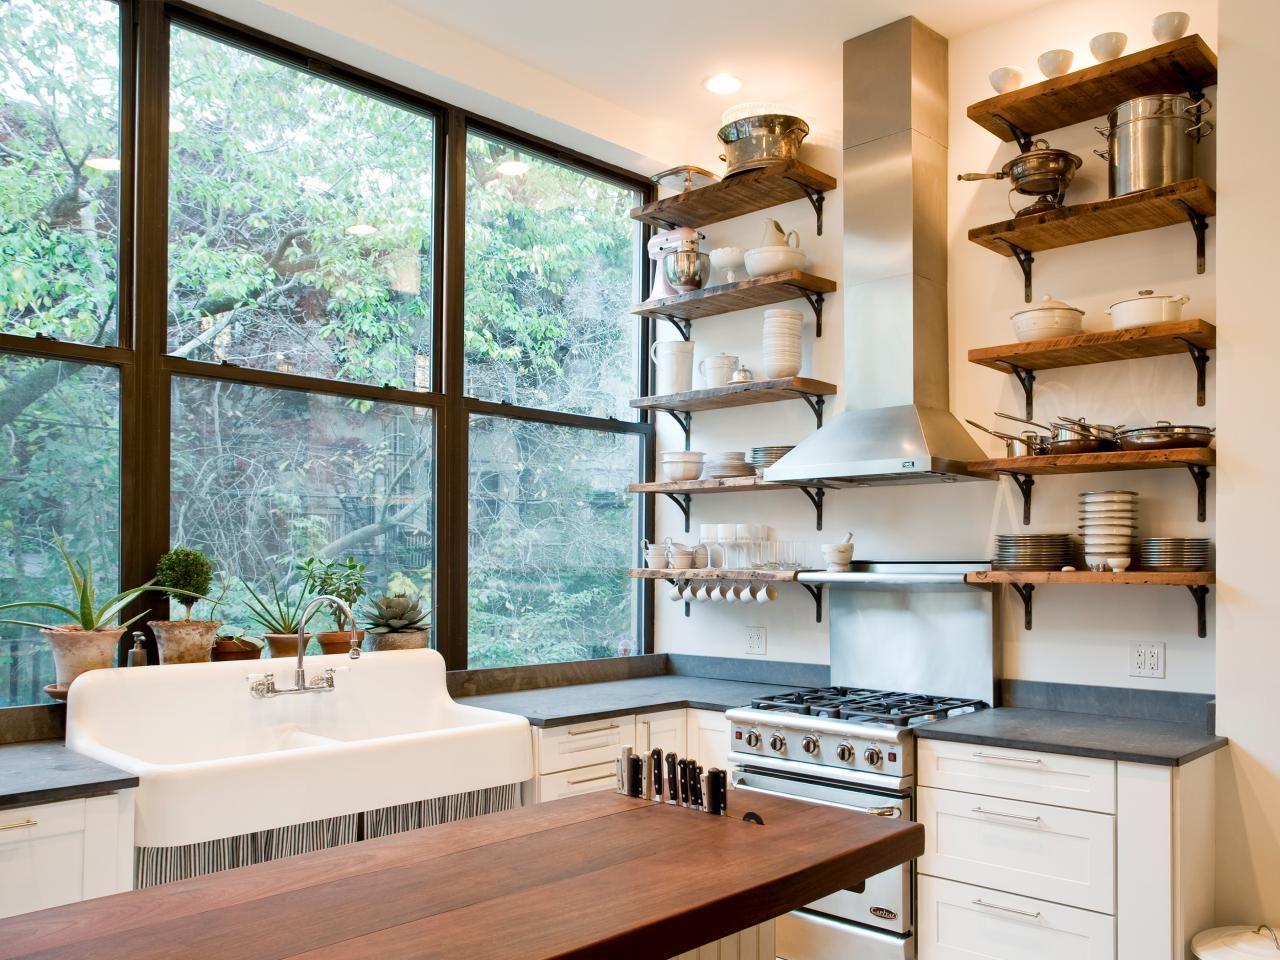 Kitchen Storage Ideas  Block Island Open Shelves And Butcher Blocks Custom Kitchen Shelves Designs Inspiration Design